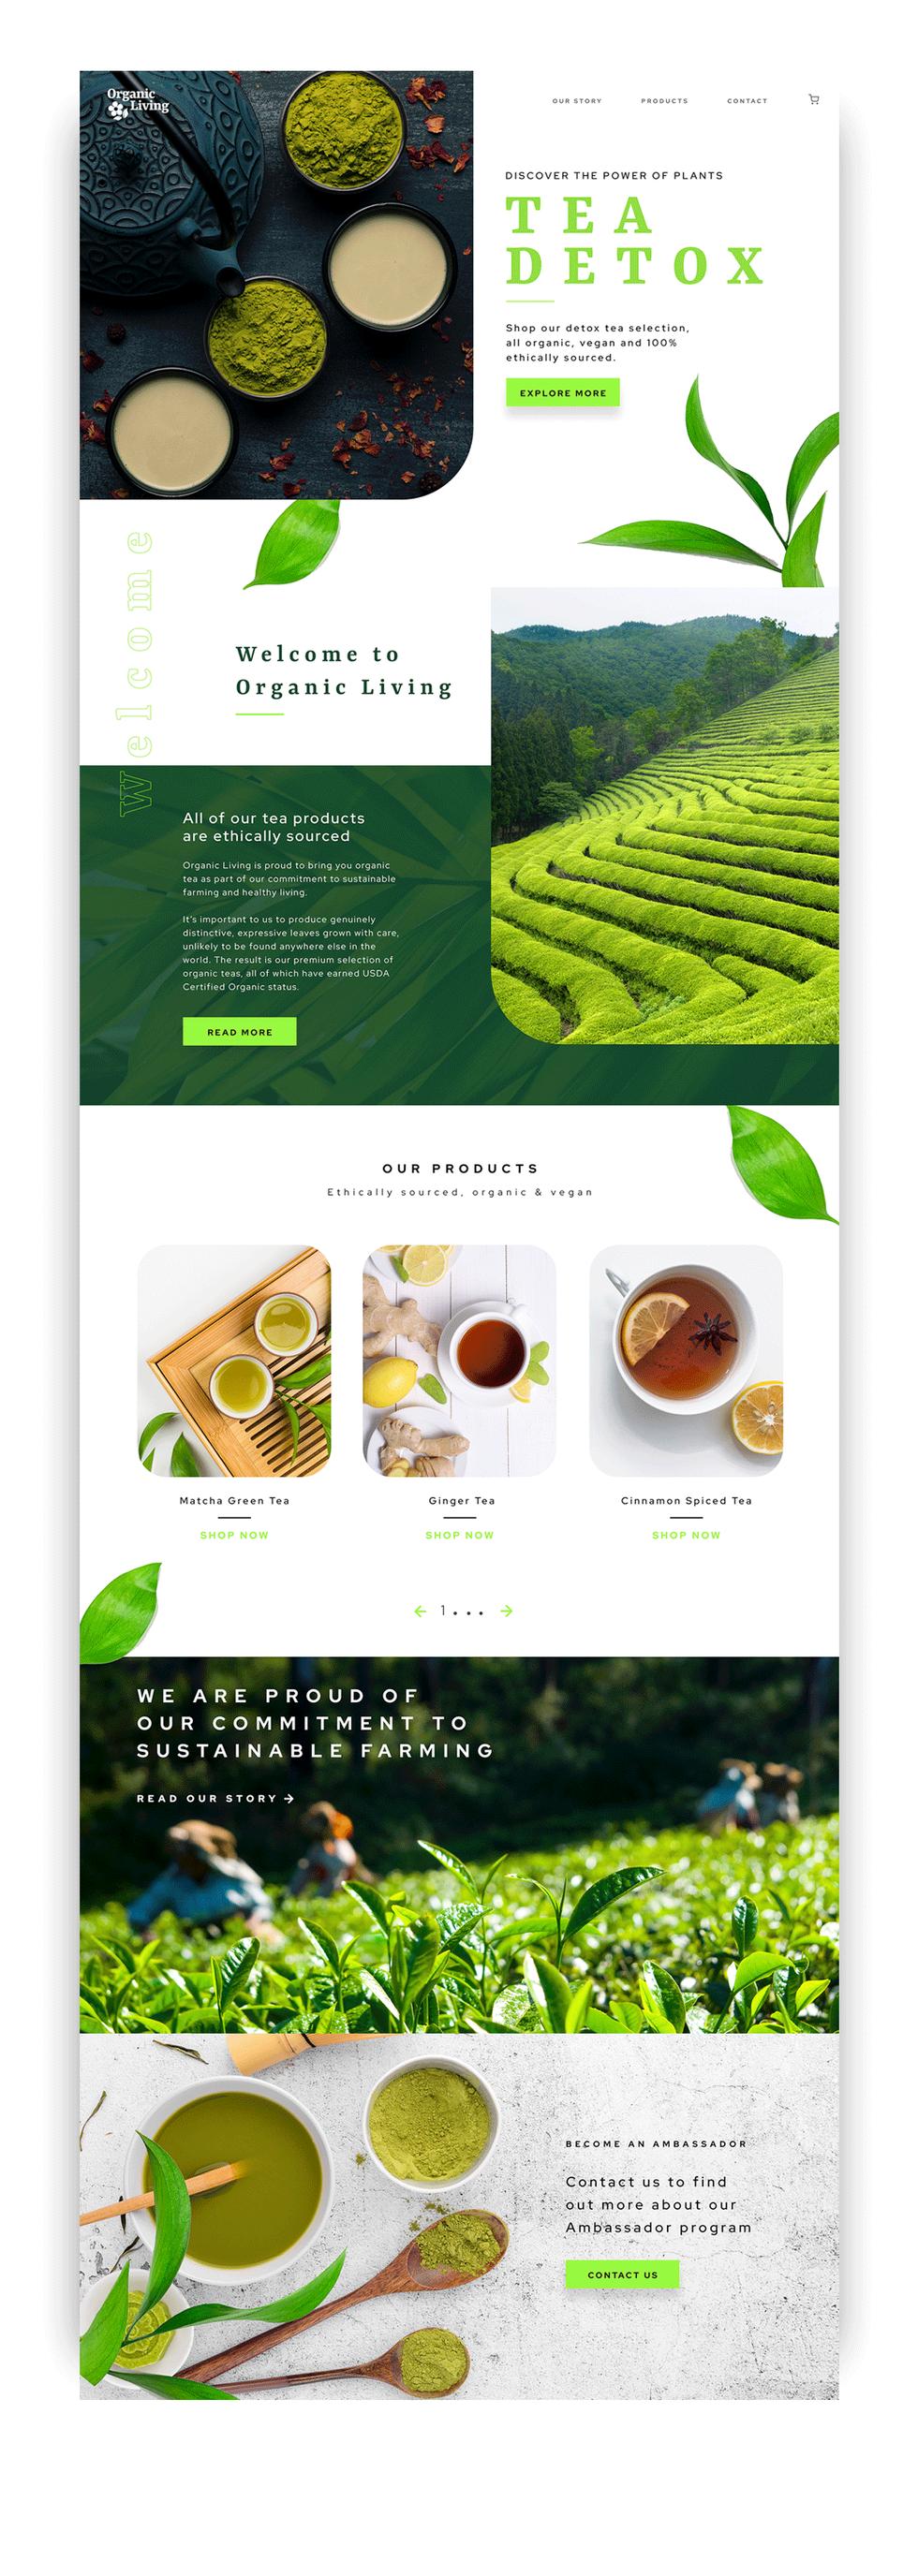 Tea detox website design